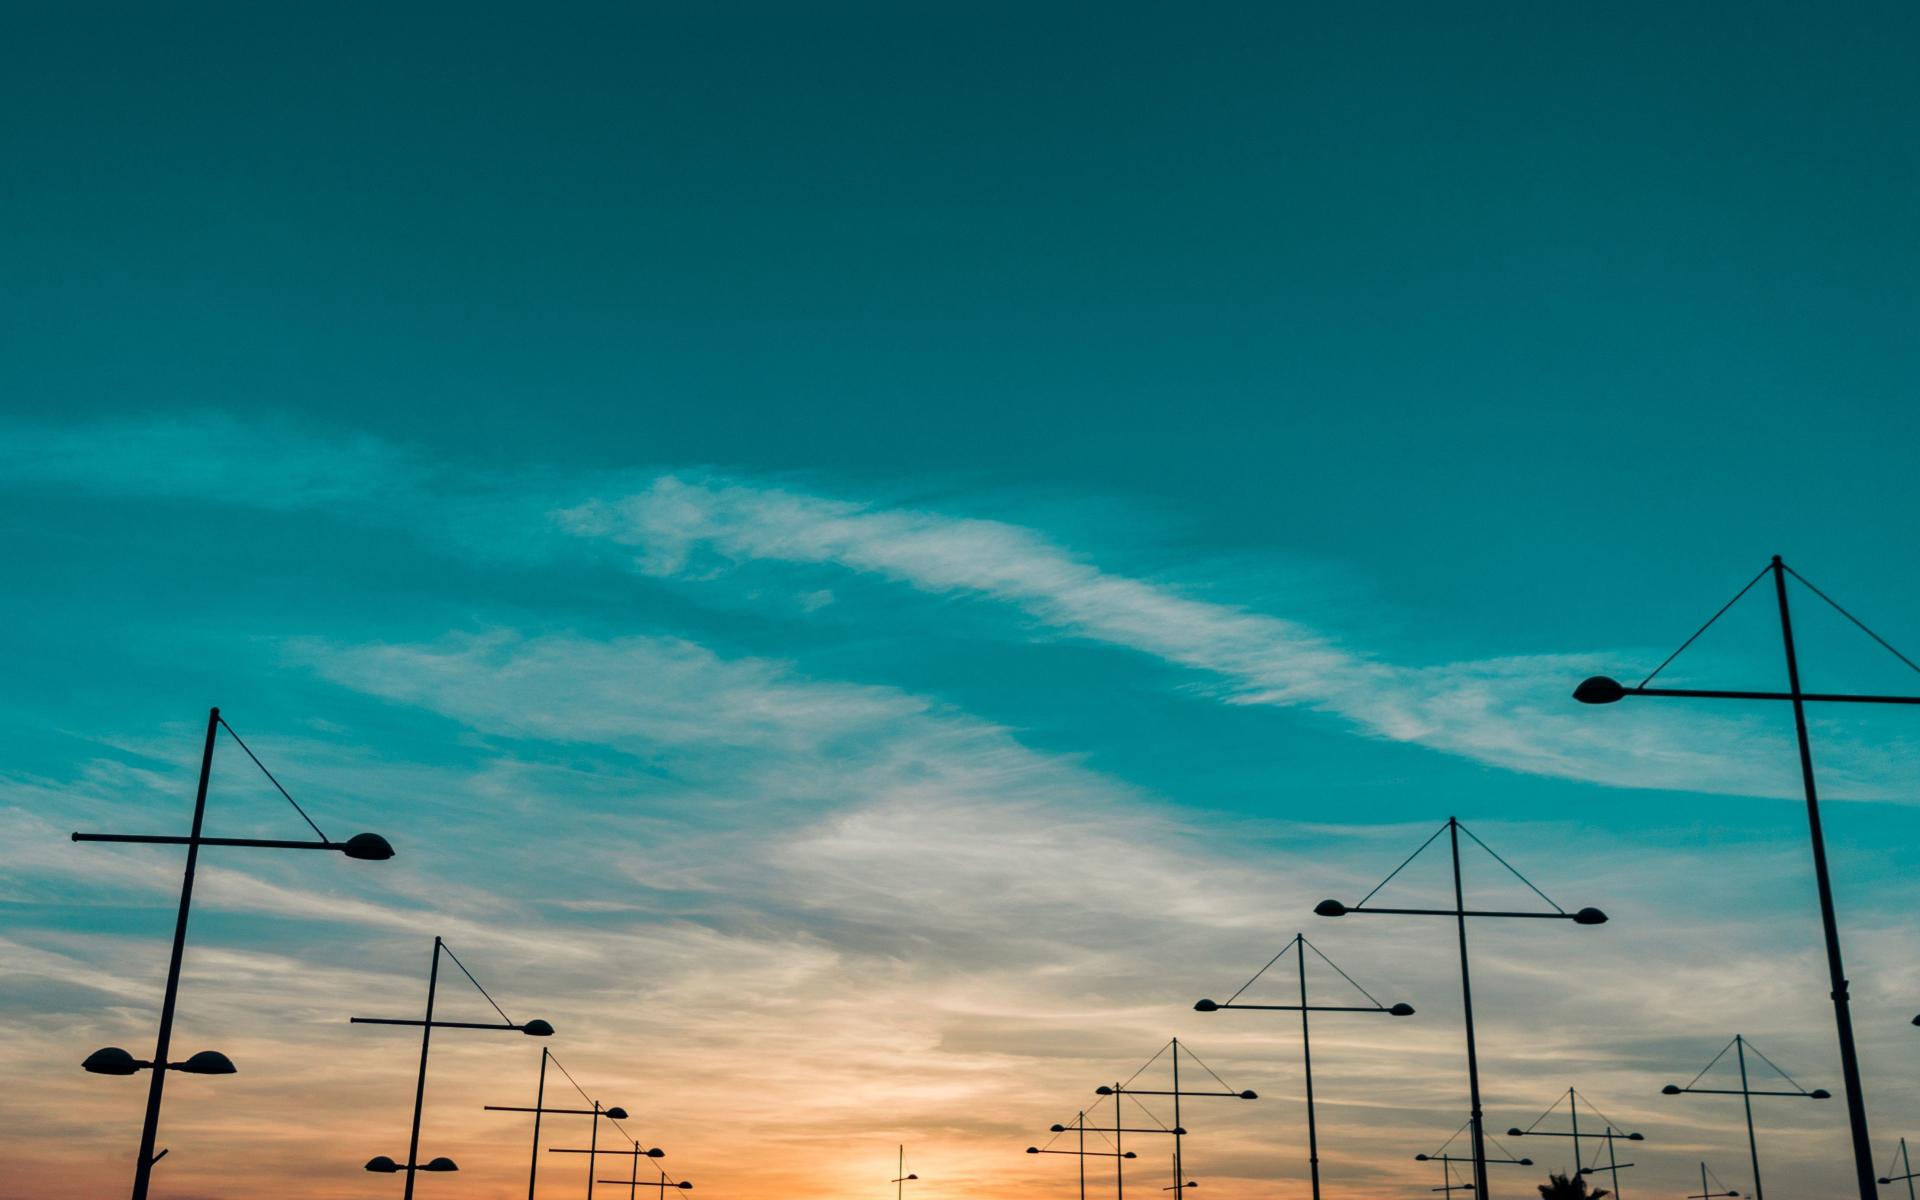 Sunset, landscape, skyline, 1920x1200 wallpaper